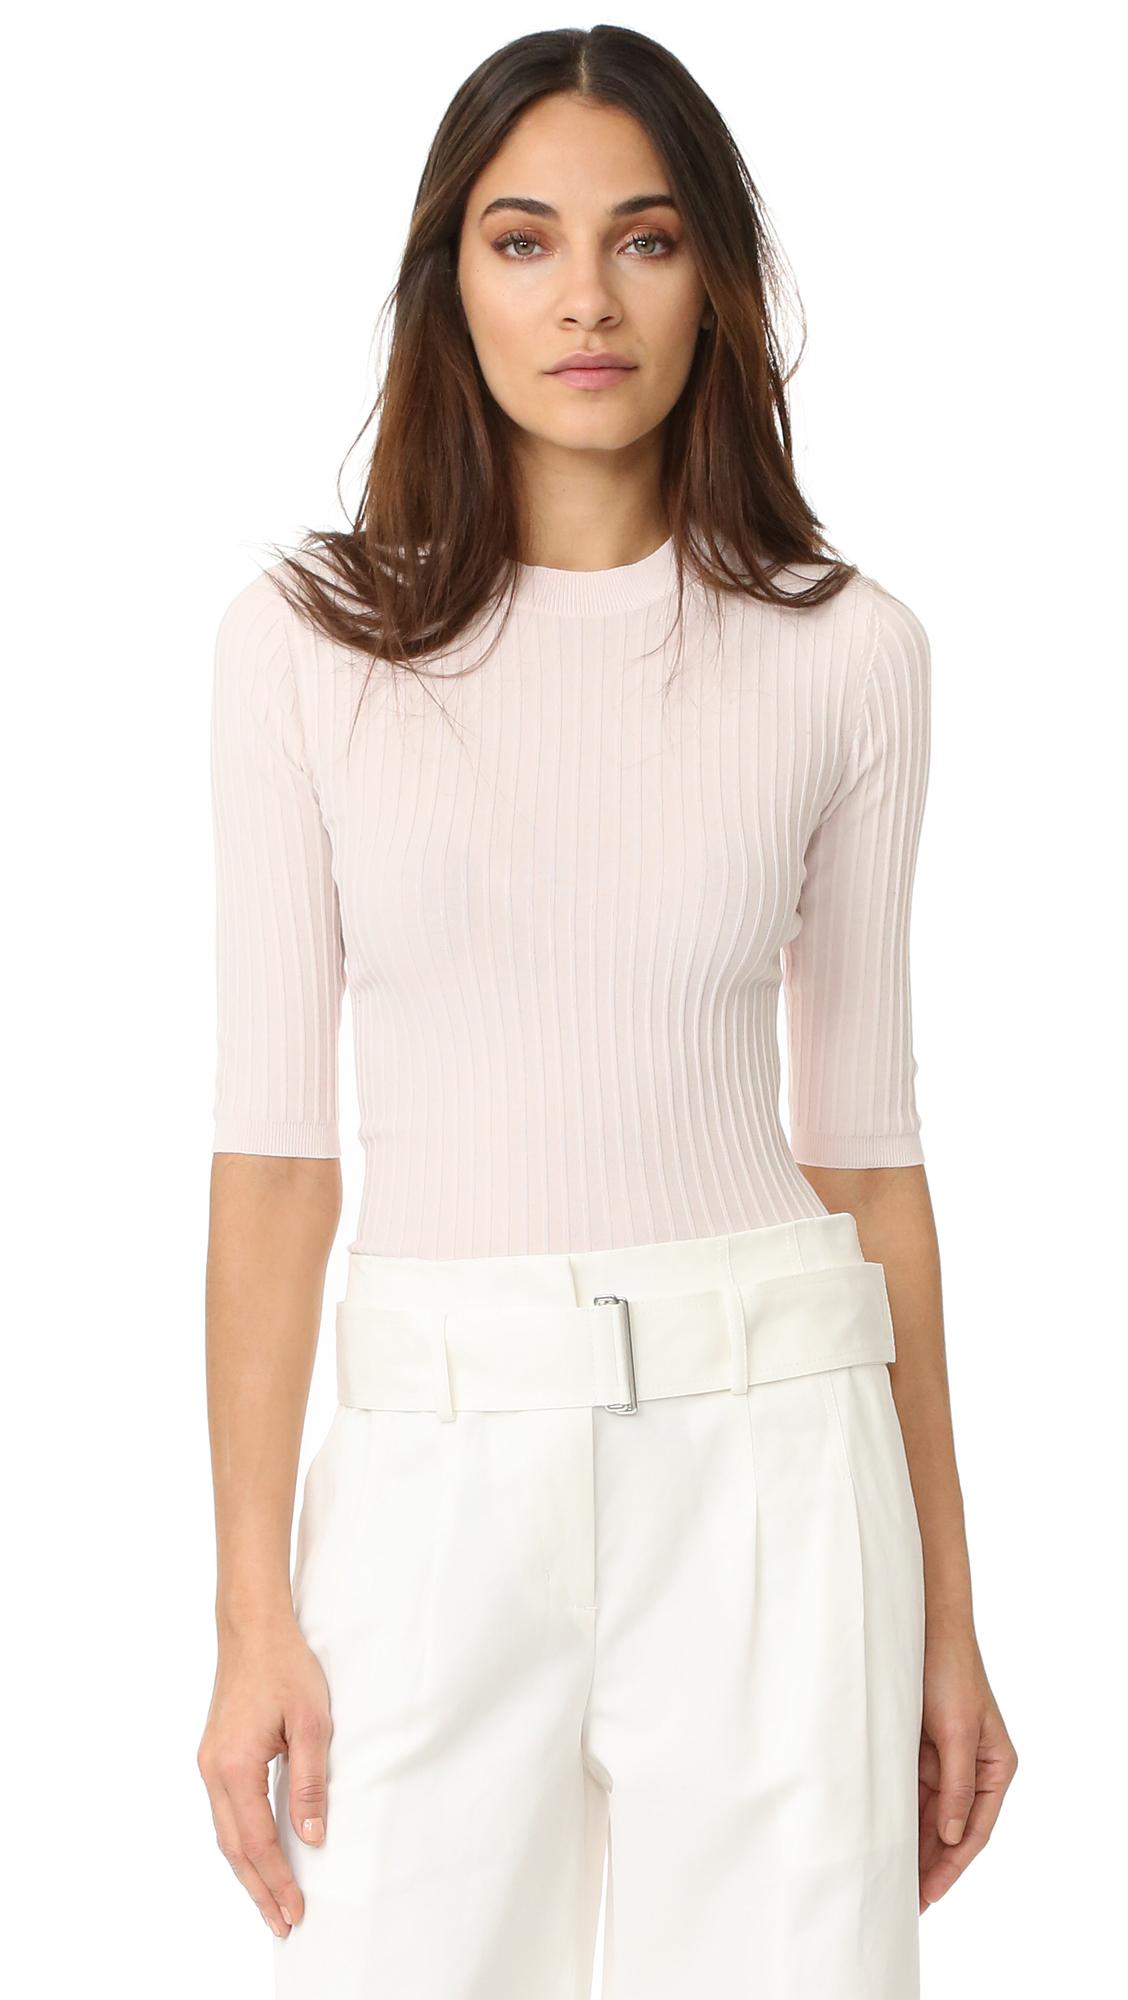 Acne Studios Iza Rib 3/4 Sleeve Sweater - Pale Pink at Shopbop